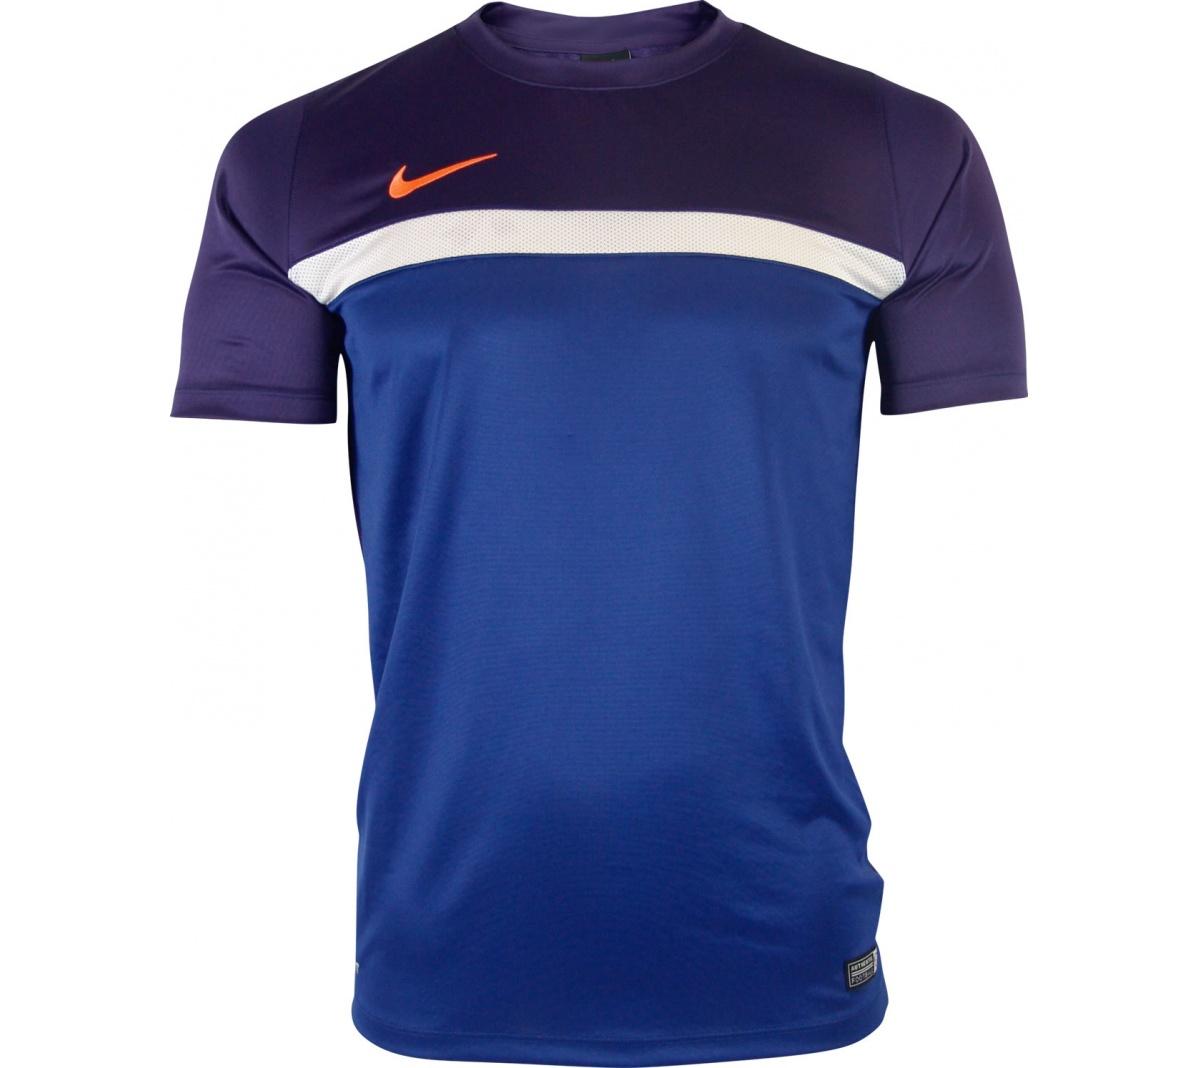 bb192fd237066 Camisa Nike Academy SS Training Roxo Camisa Nike Academy SS Training Roxo  ...